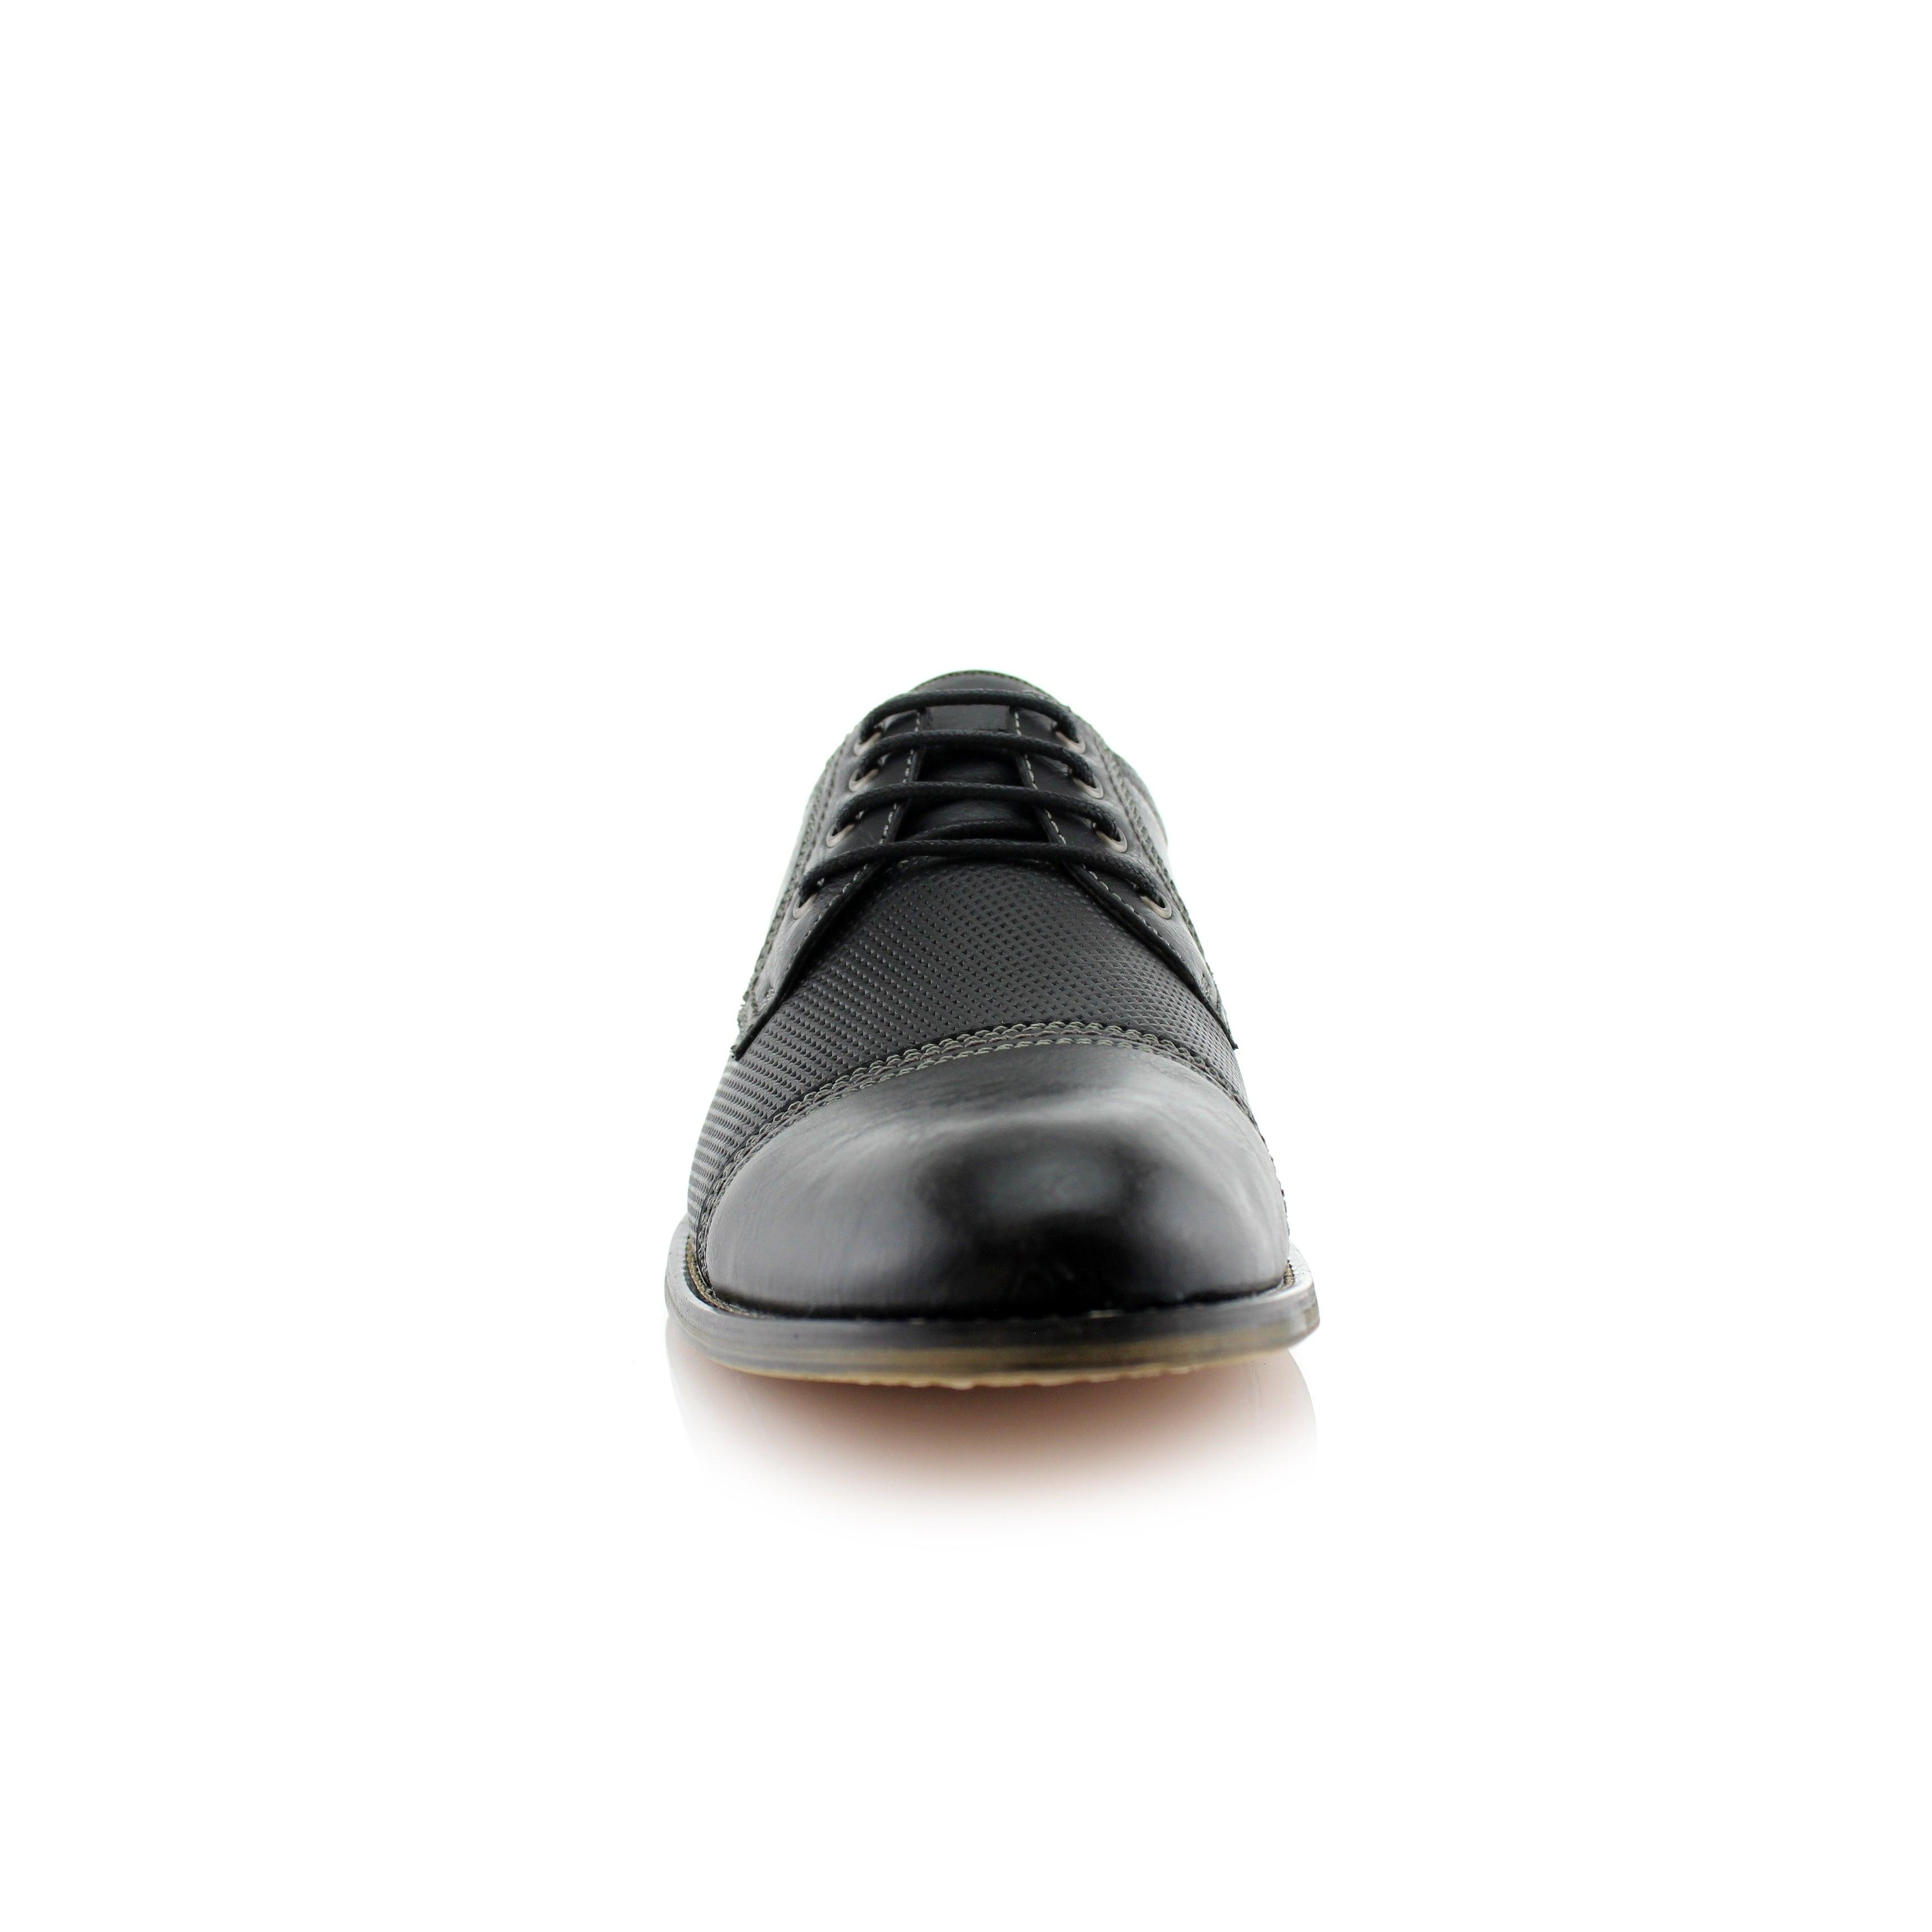 Ferro-Aldo-Felix-MFA19605L-Men-039-s-Dress-Shoes-For-Work-or thumbnail 10